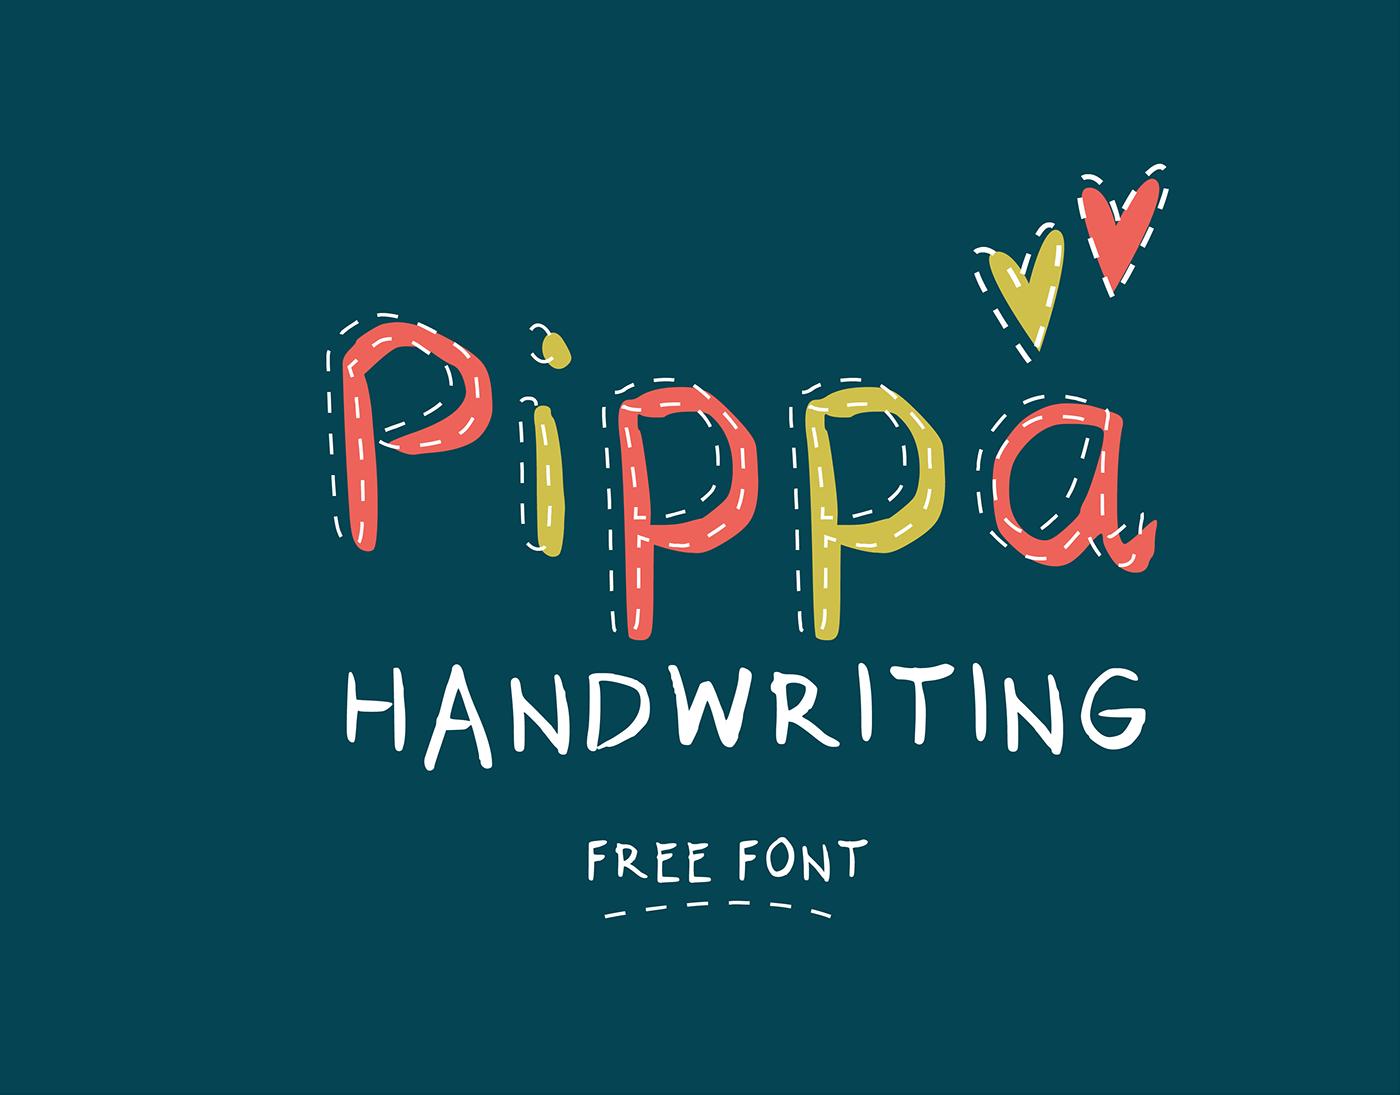 free freebie font handwriting coowini queenie appleyard pomaceia